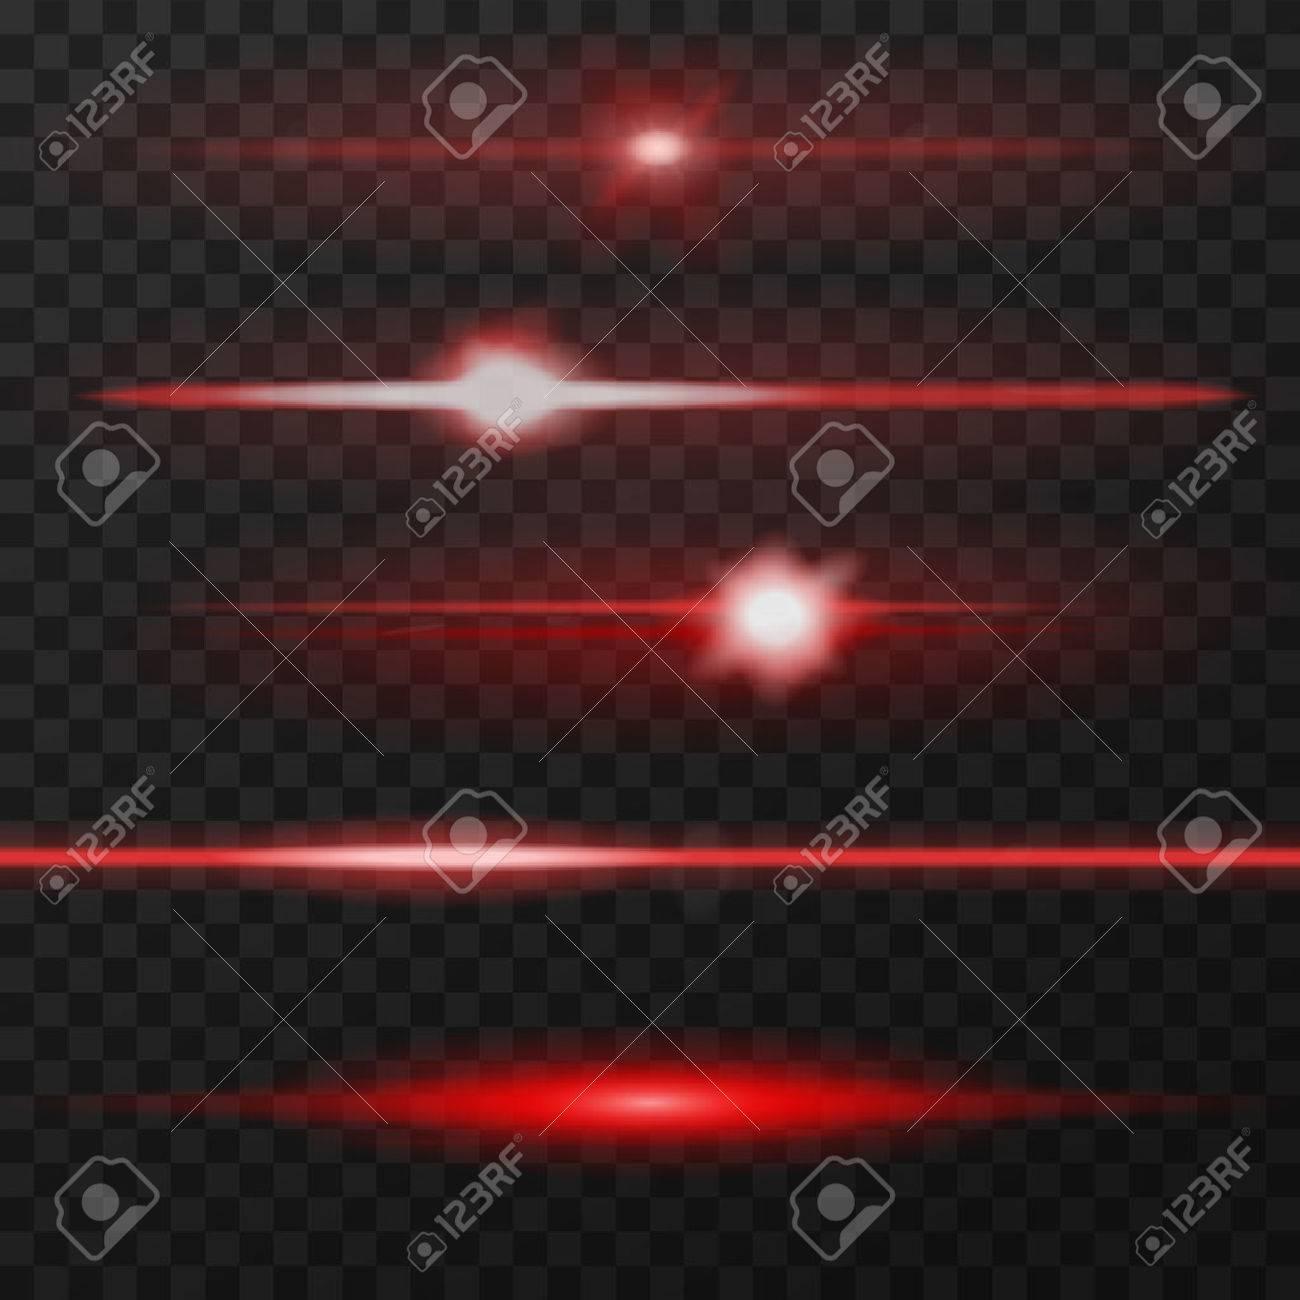 Red horizontal lens flares pack. Laser beams, horizontal light rays. - 51620880